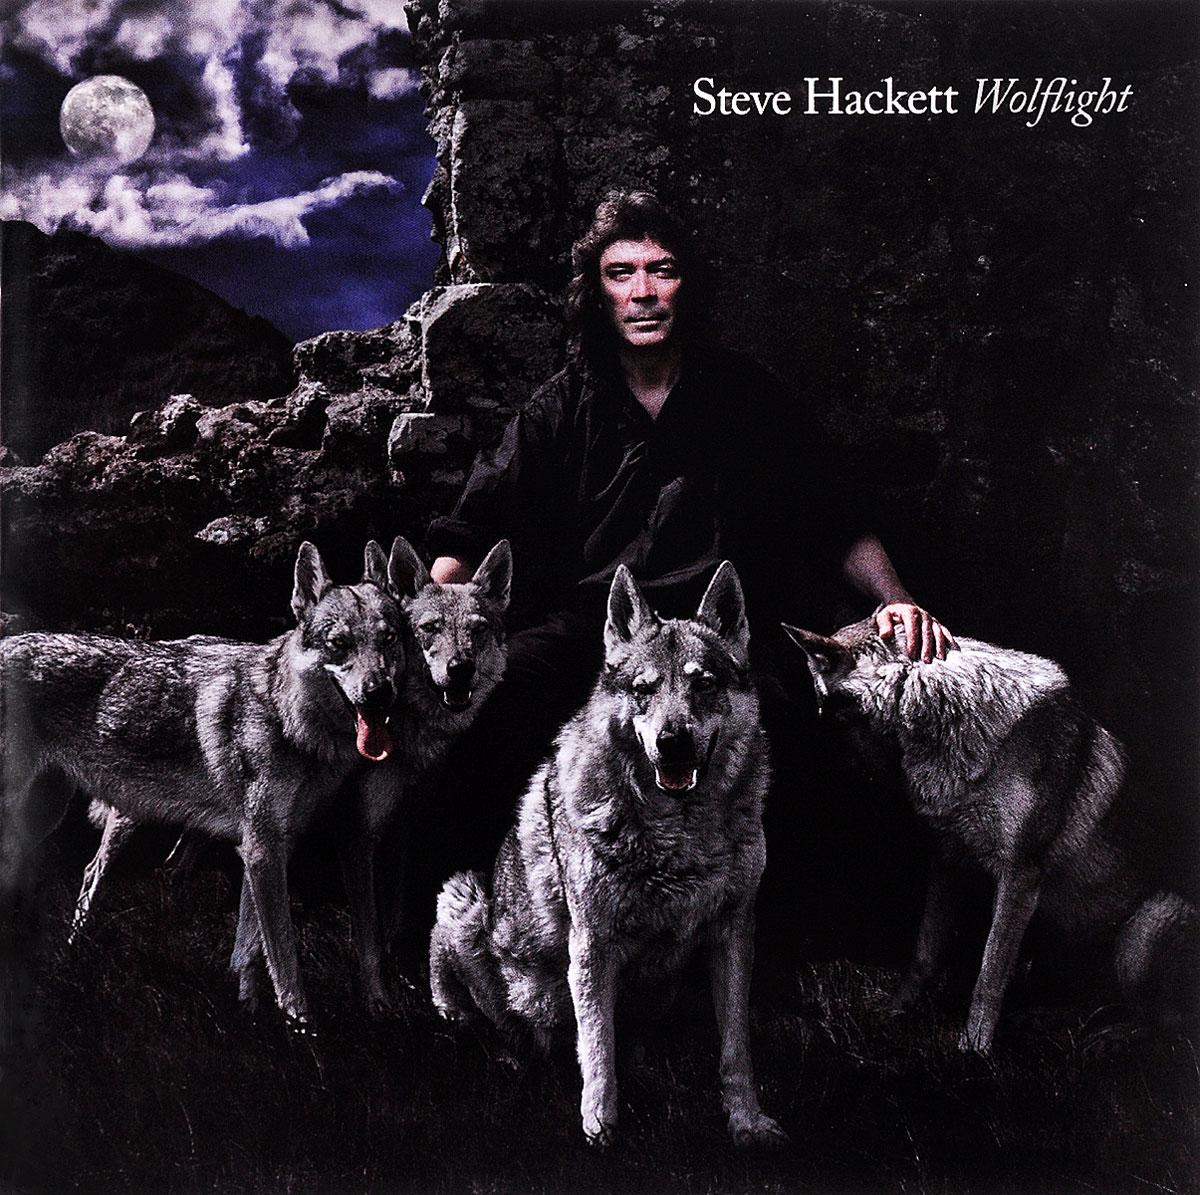 все цены на Стив Хэкетт Steve Hackett. Wolflight